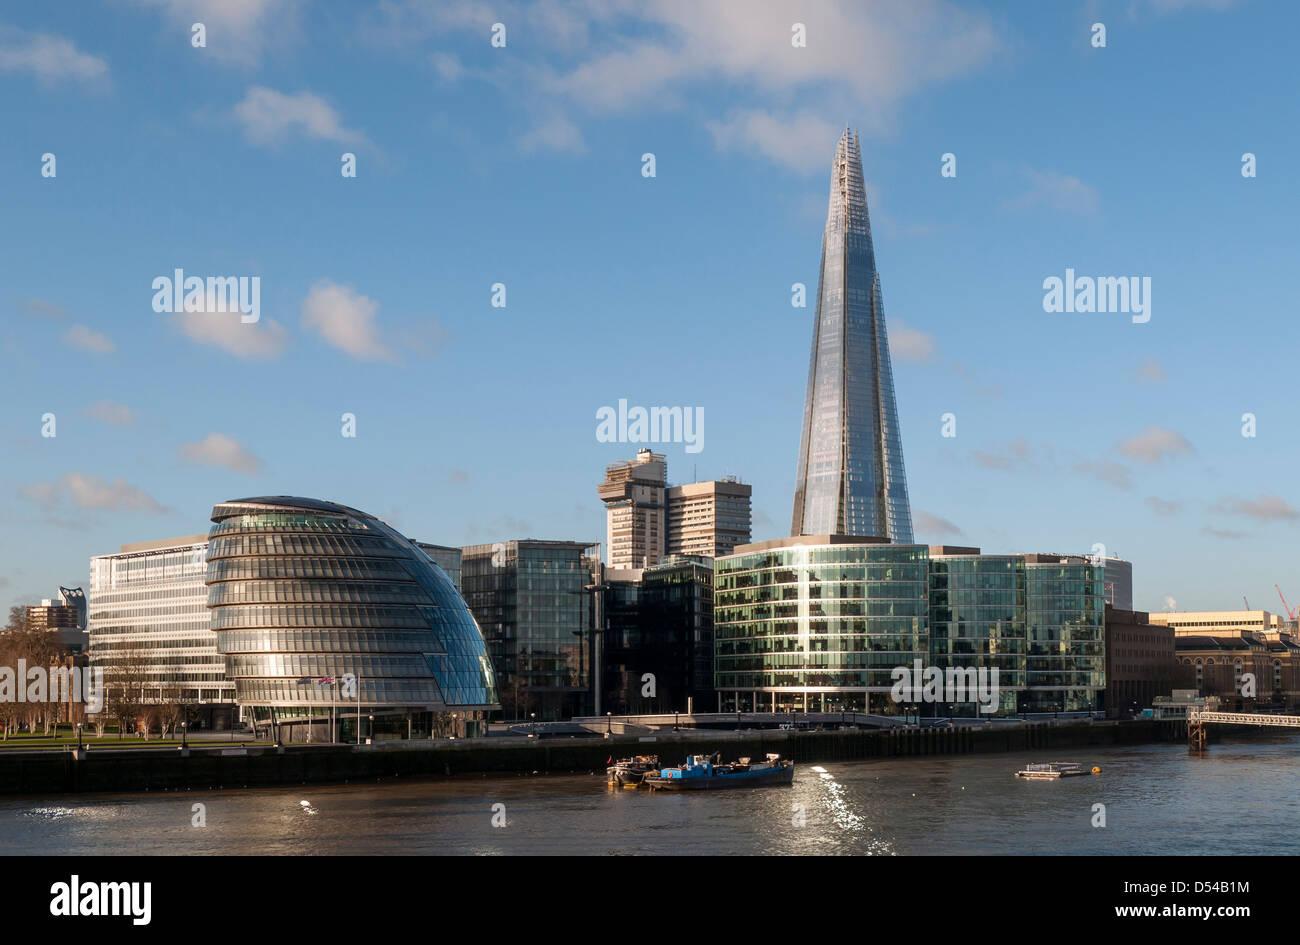 London City Hall (GLA Building) and The Shard Skyscraper, England, UK - Stock Image